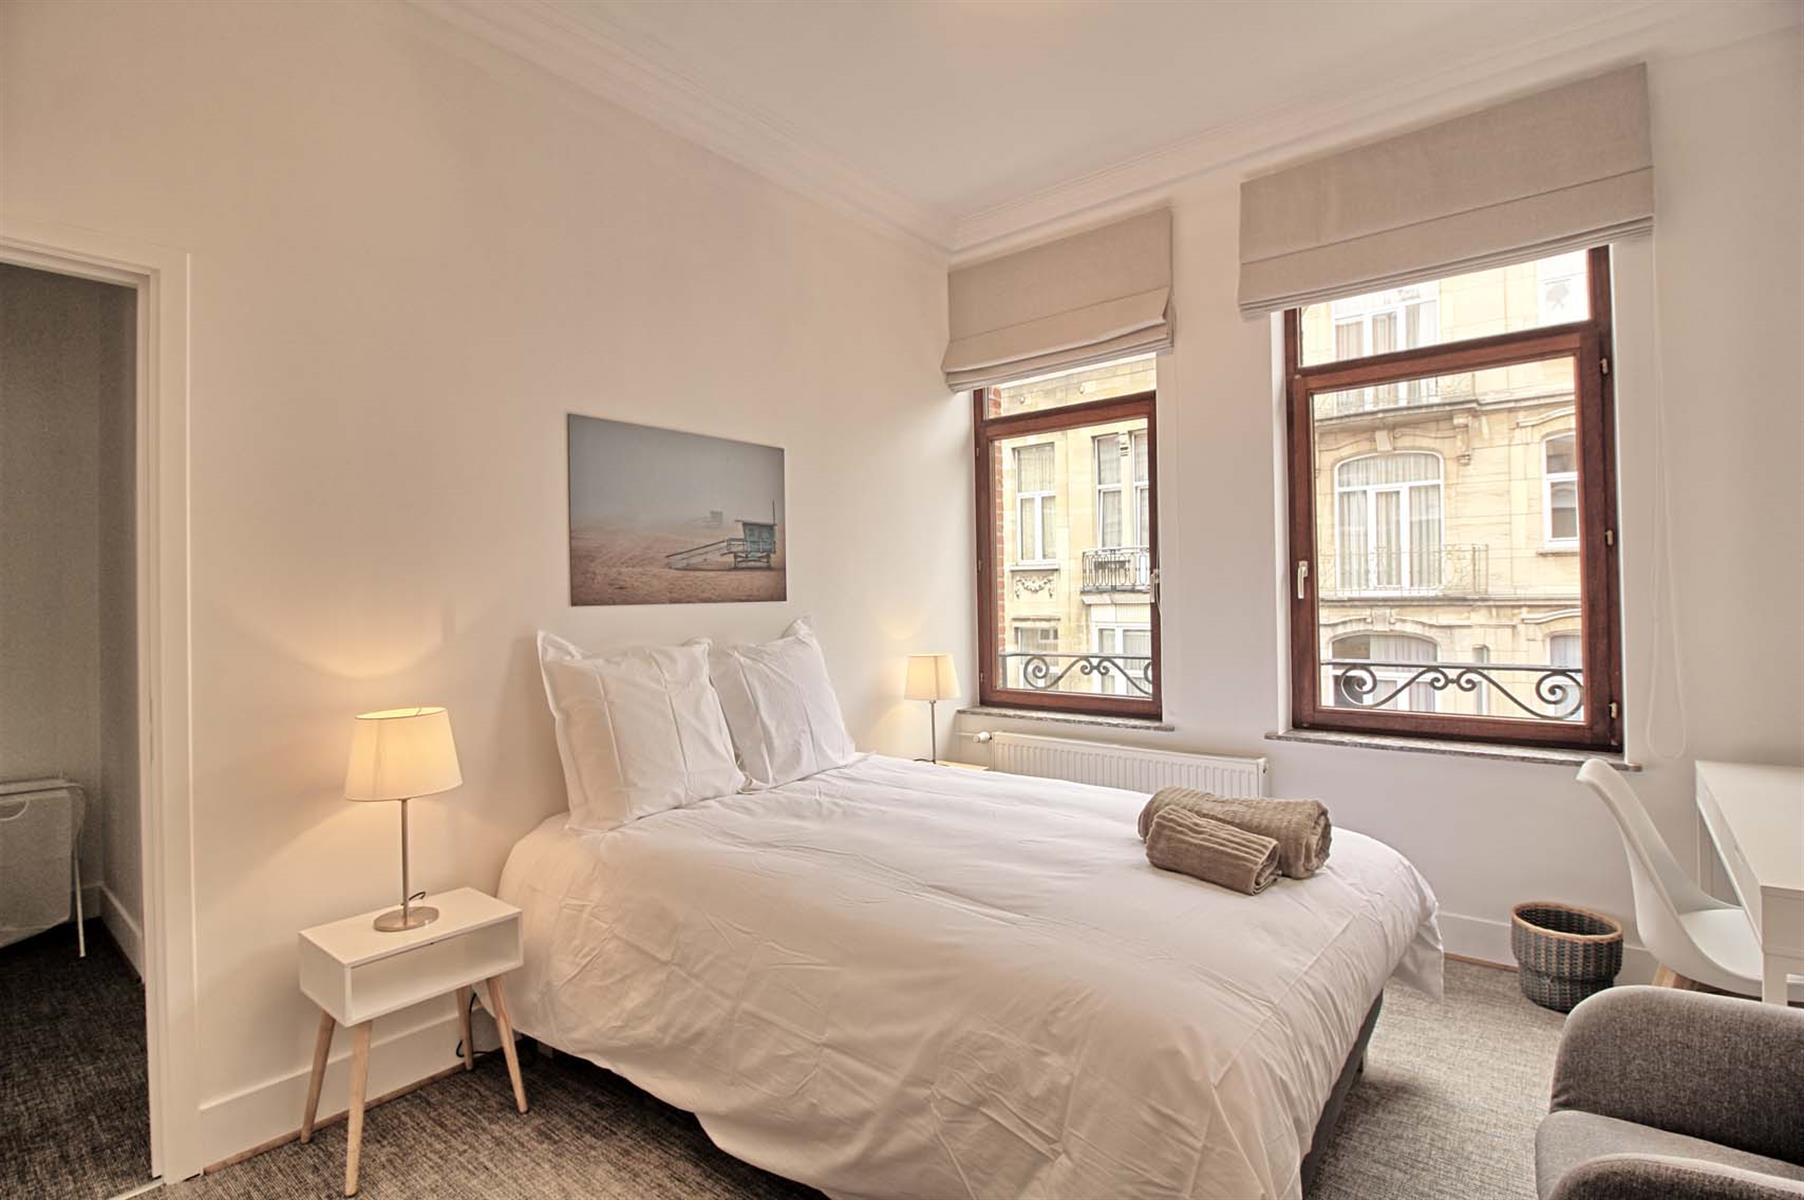 Maison - Ixelles - #4106764-17